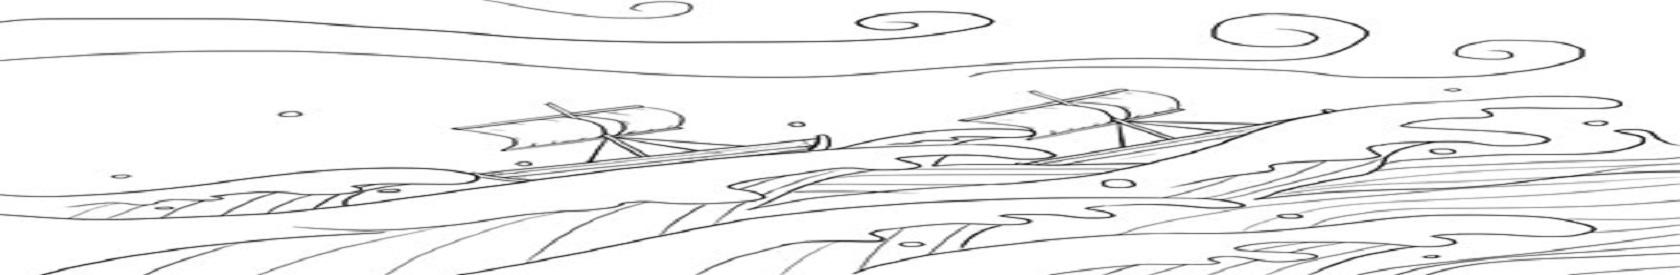 """SLEEPING THROUGH THE STORM"" – SUNDAY – 06/13/21"